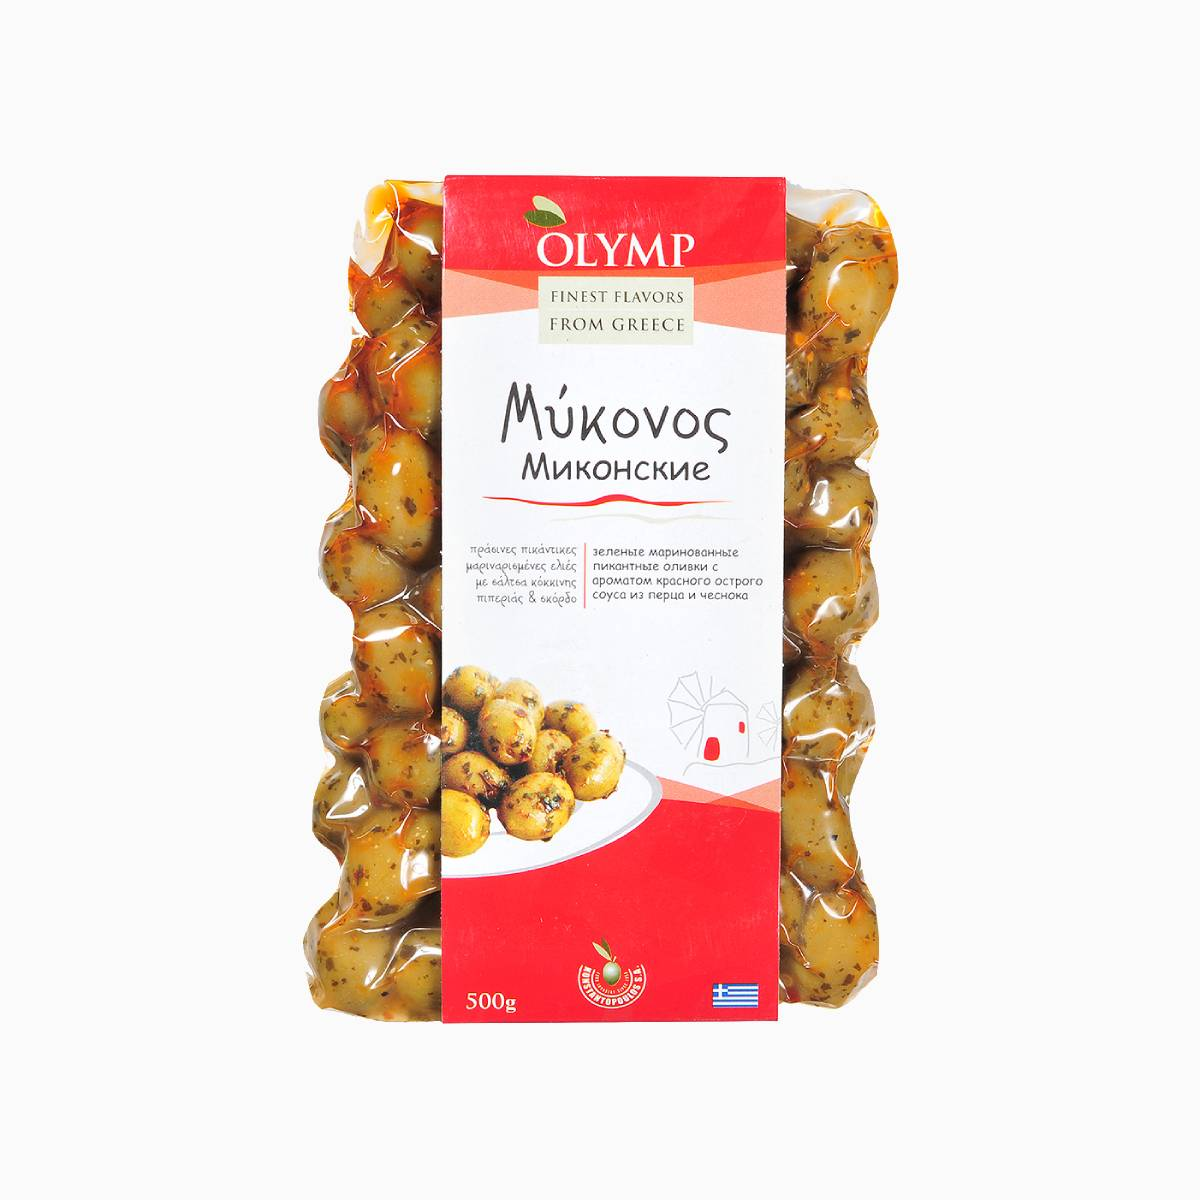 Оливки Миконские с перцем, чесноком и травами, Olymp